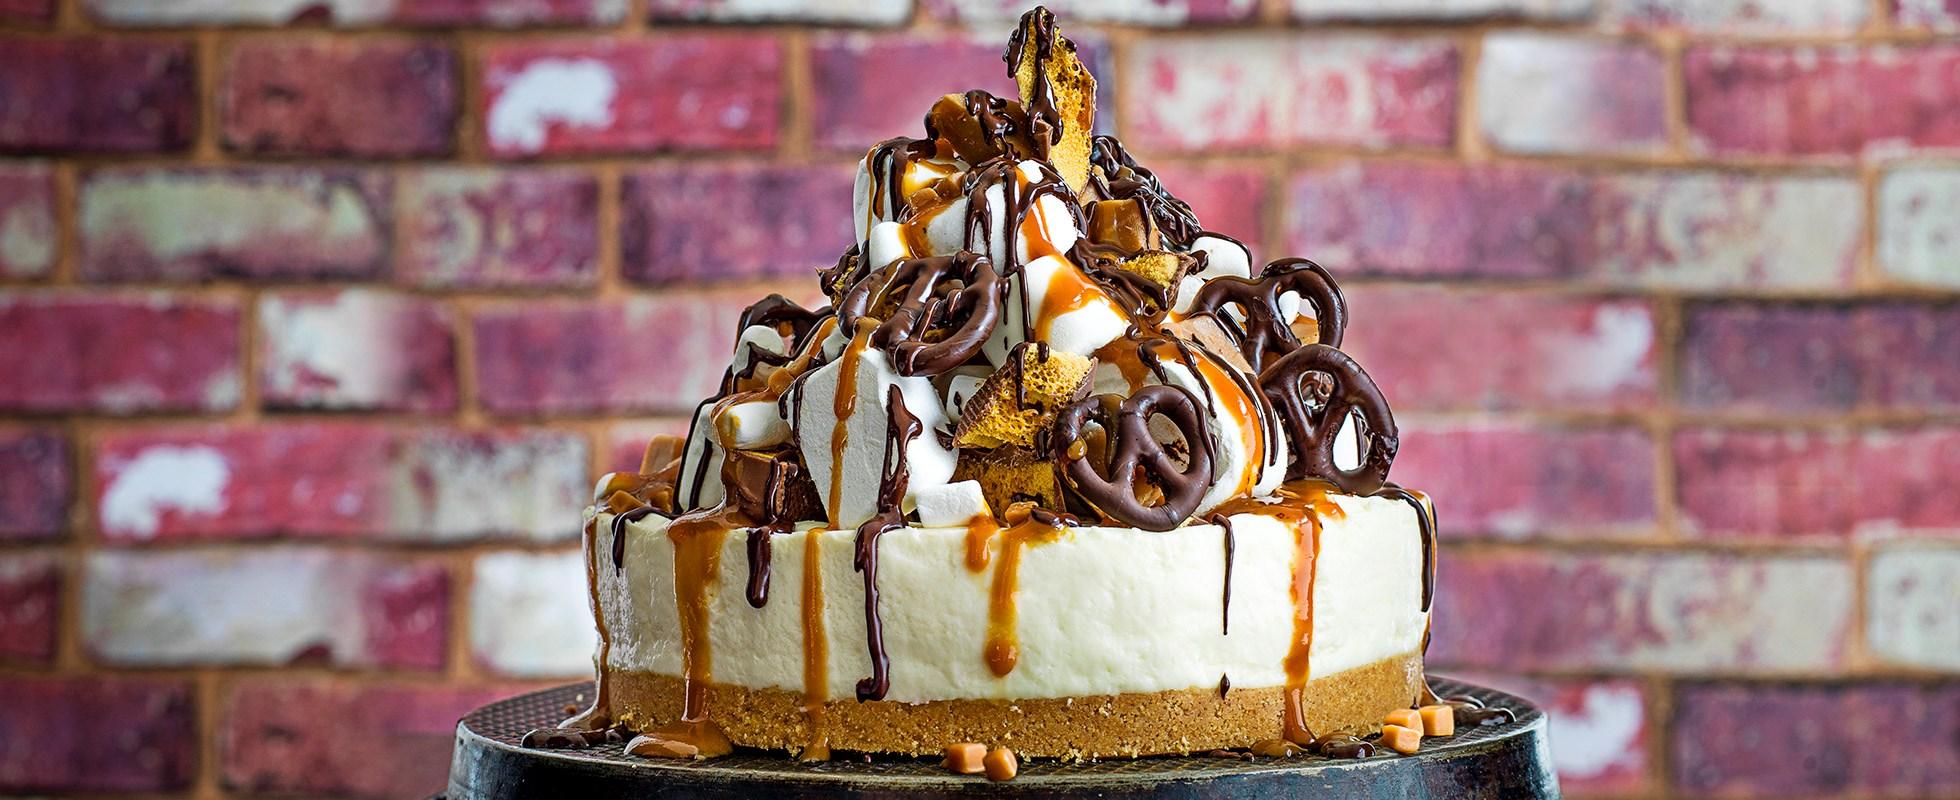 Freakshake cheesecake - Best ever cheesecake recipes